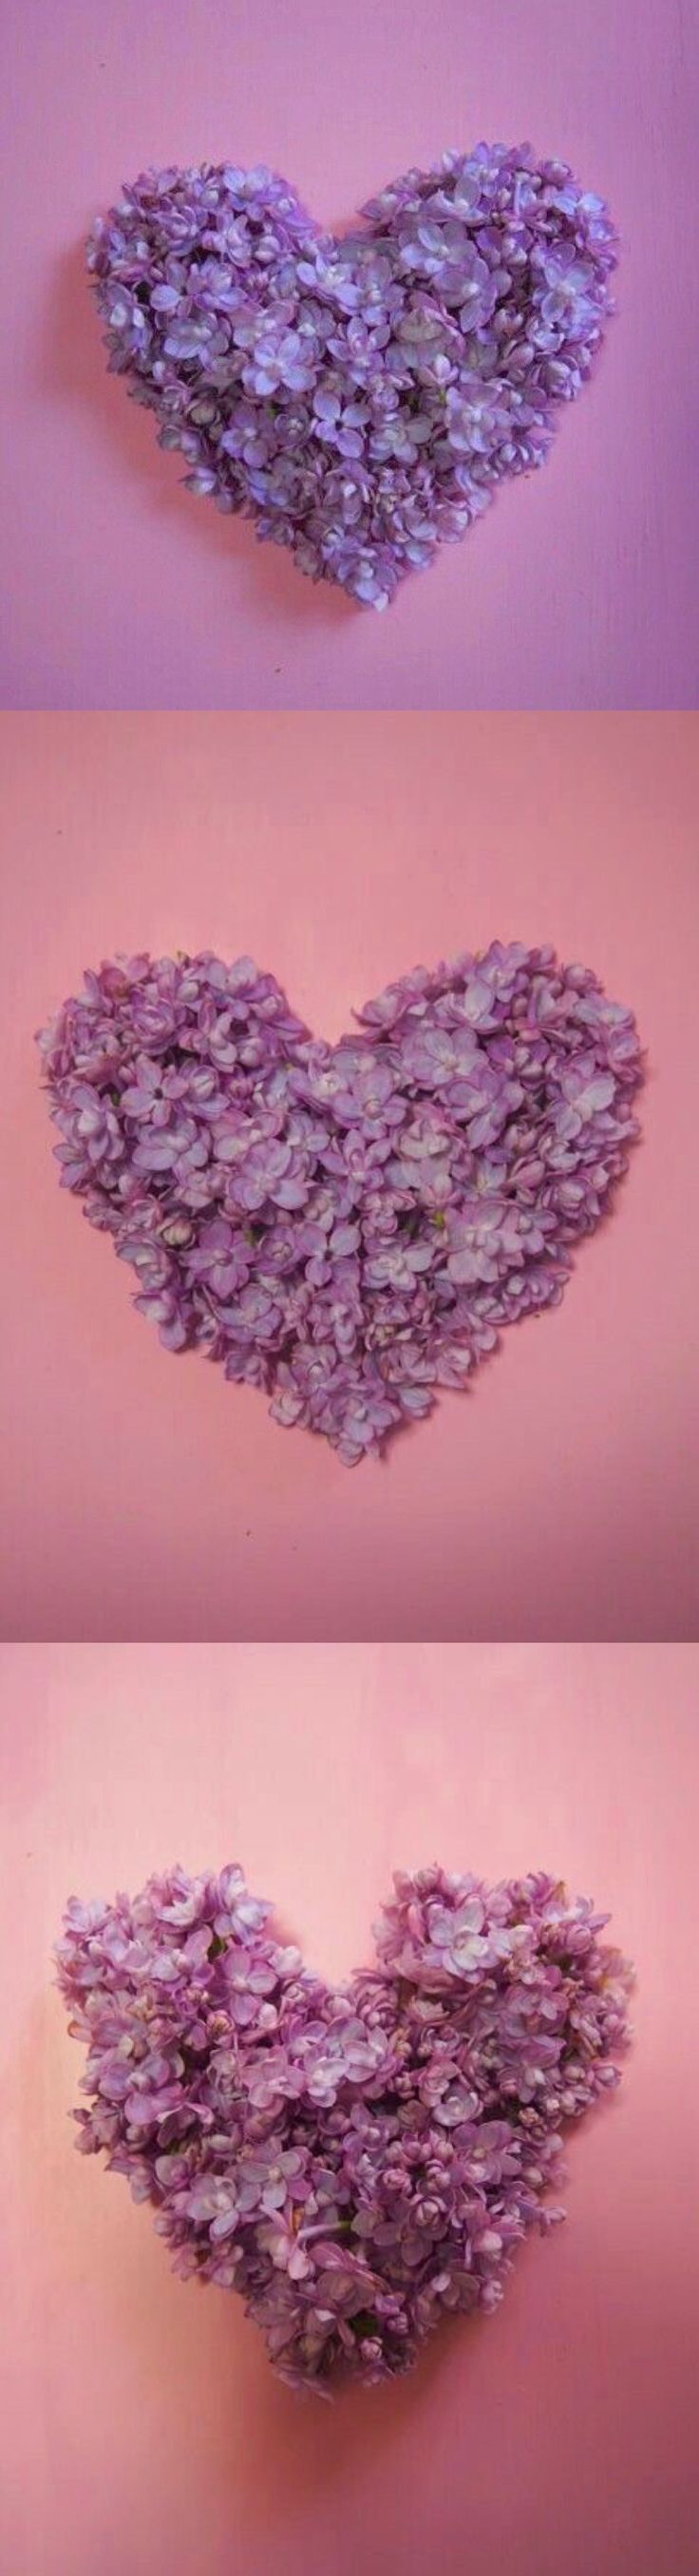 lilac heart ♡